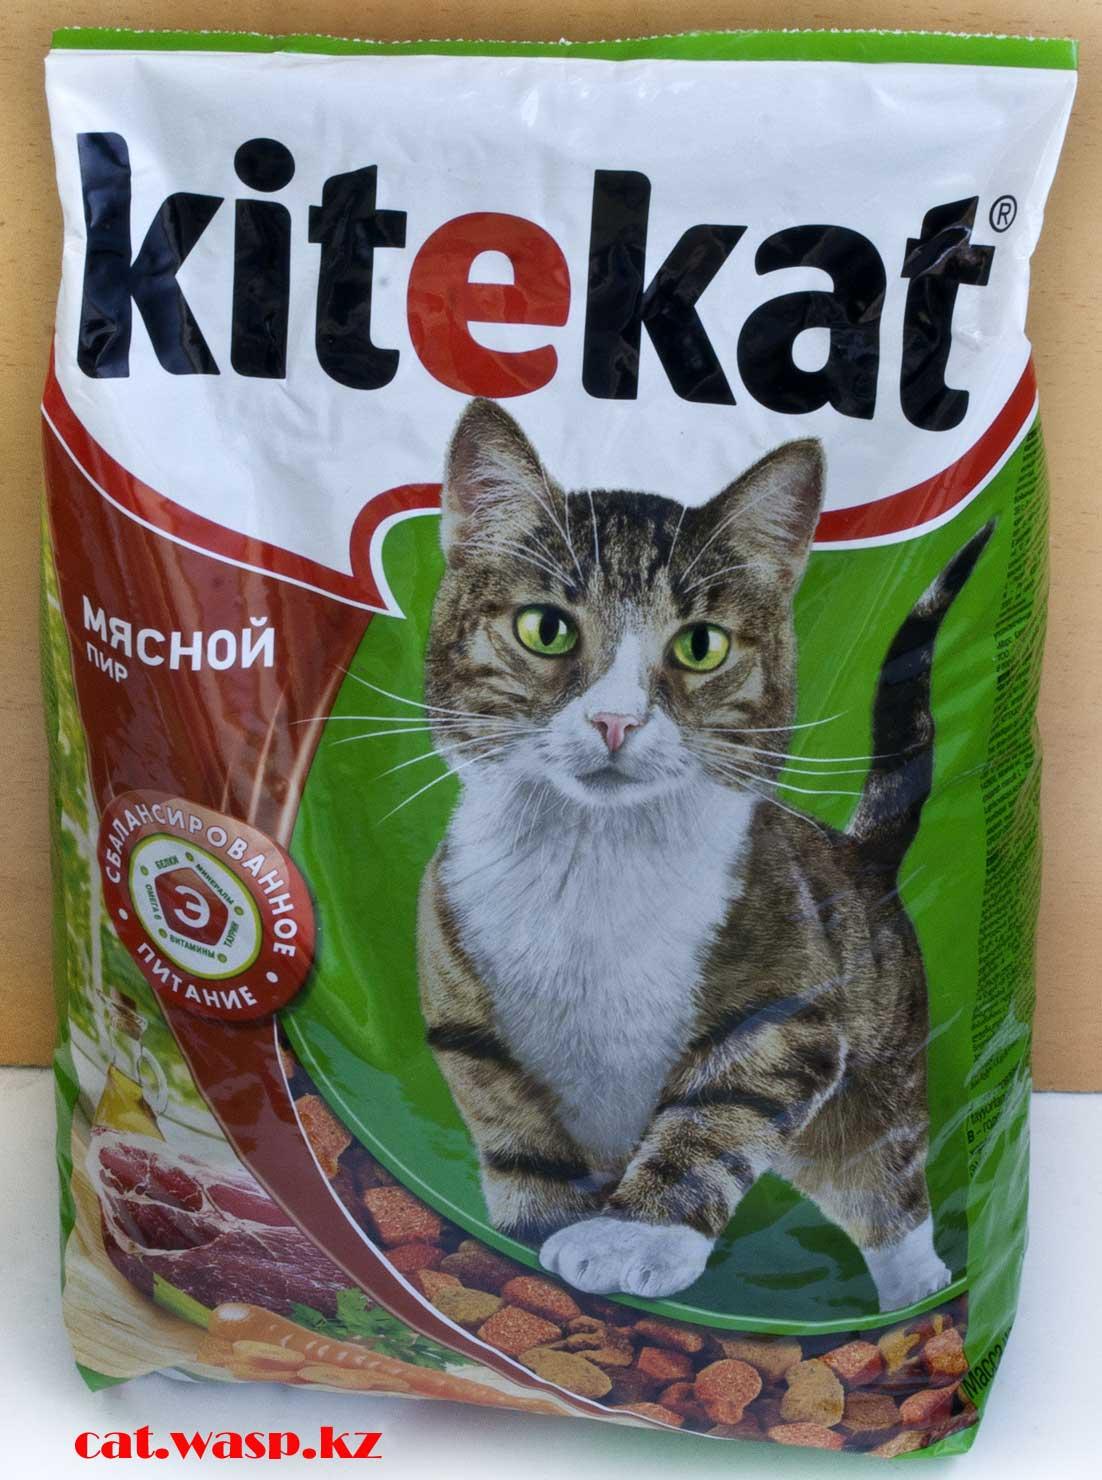 KiteKat Мясной пир - отзыв о сухом корме для кошек